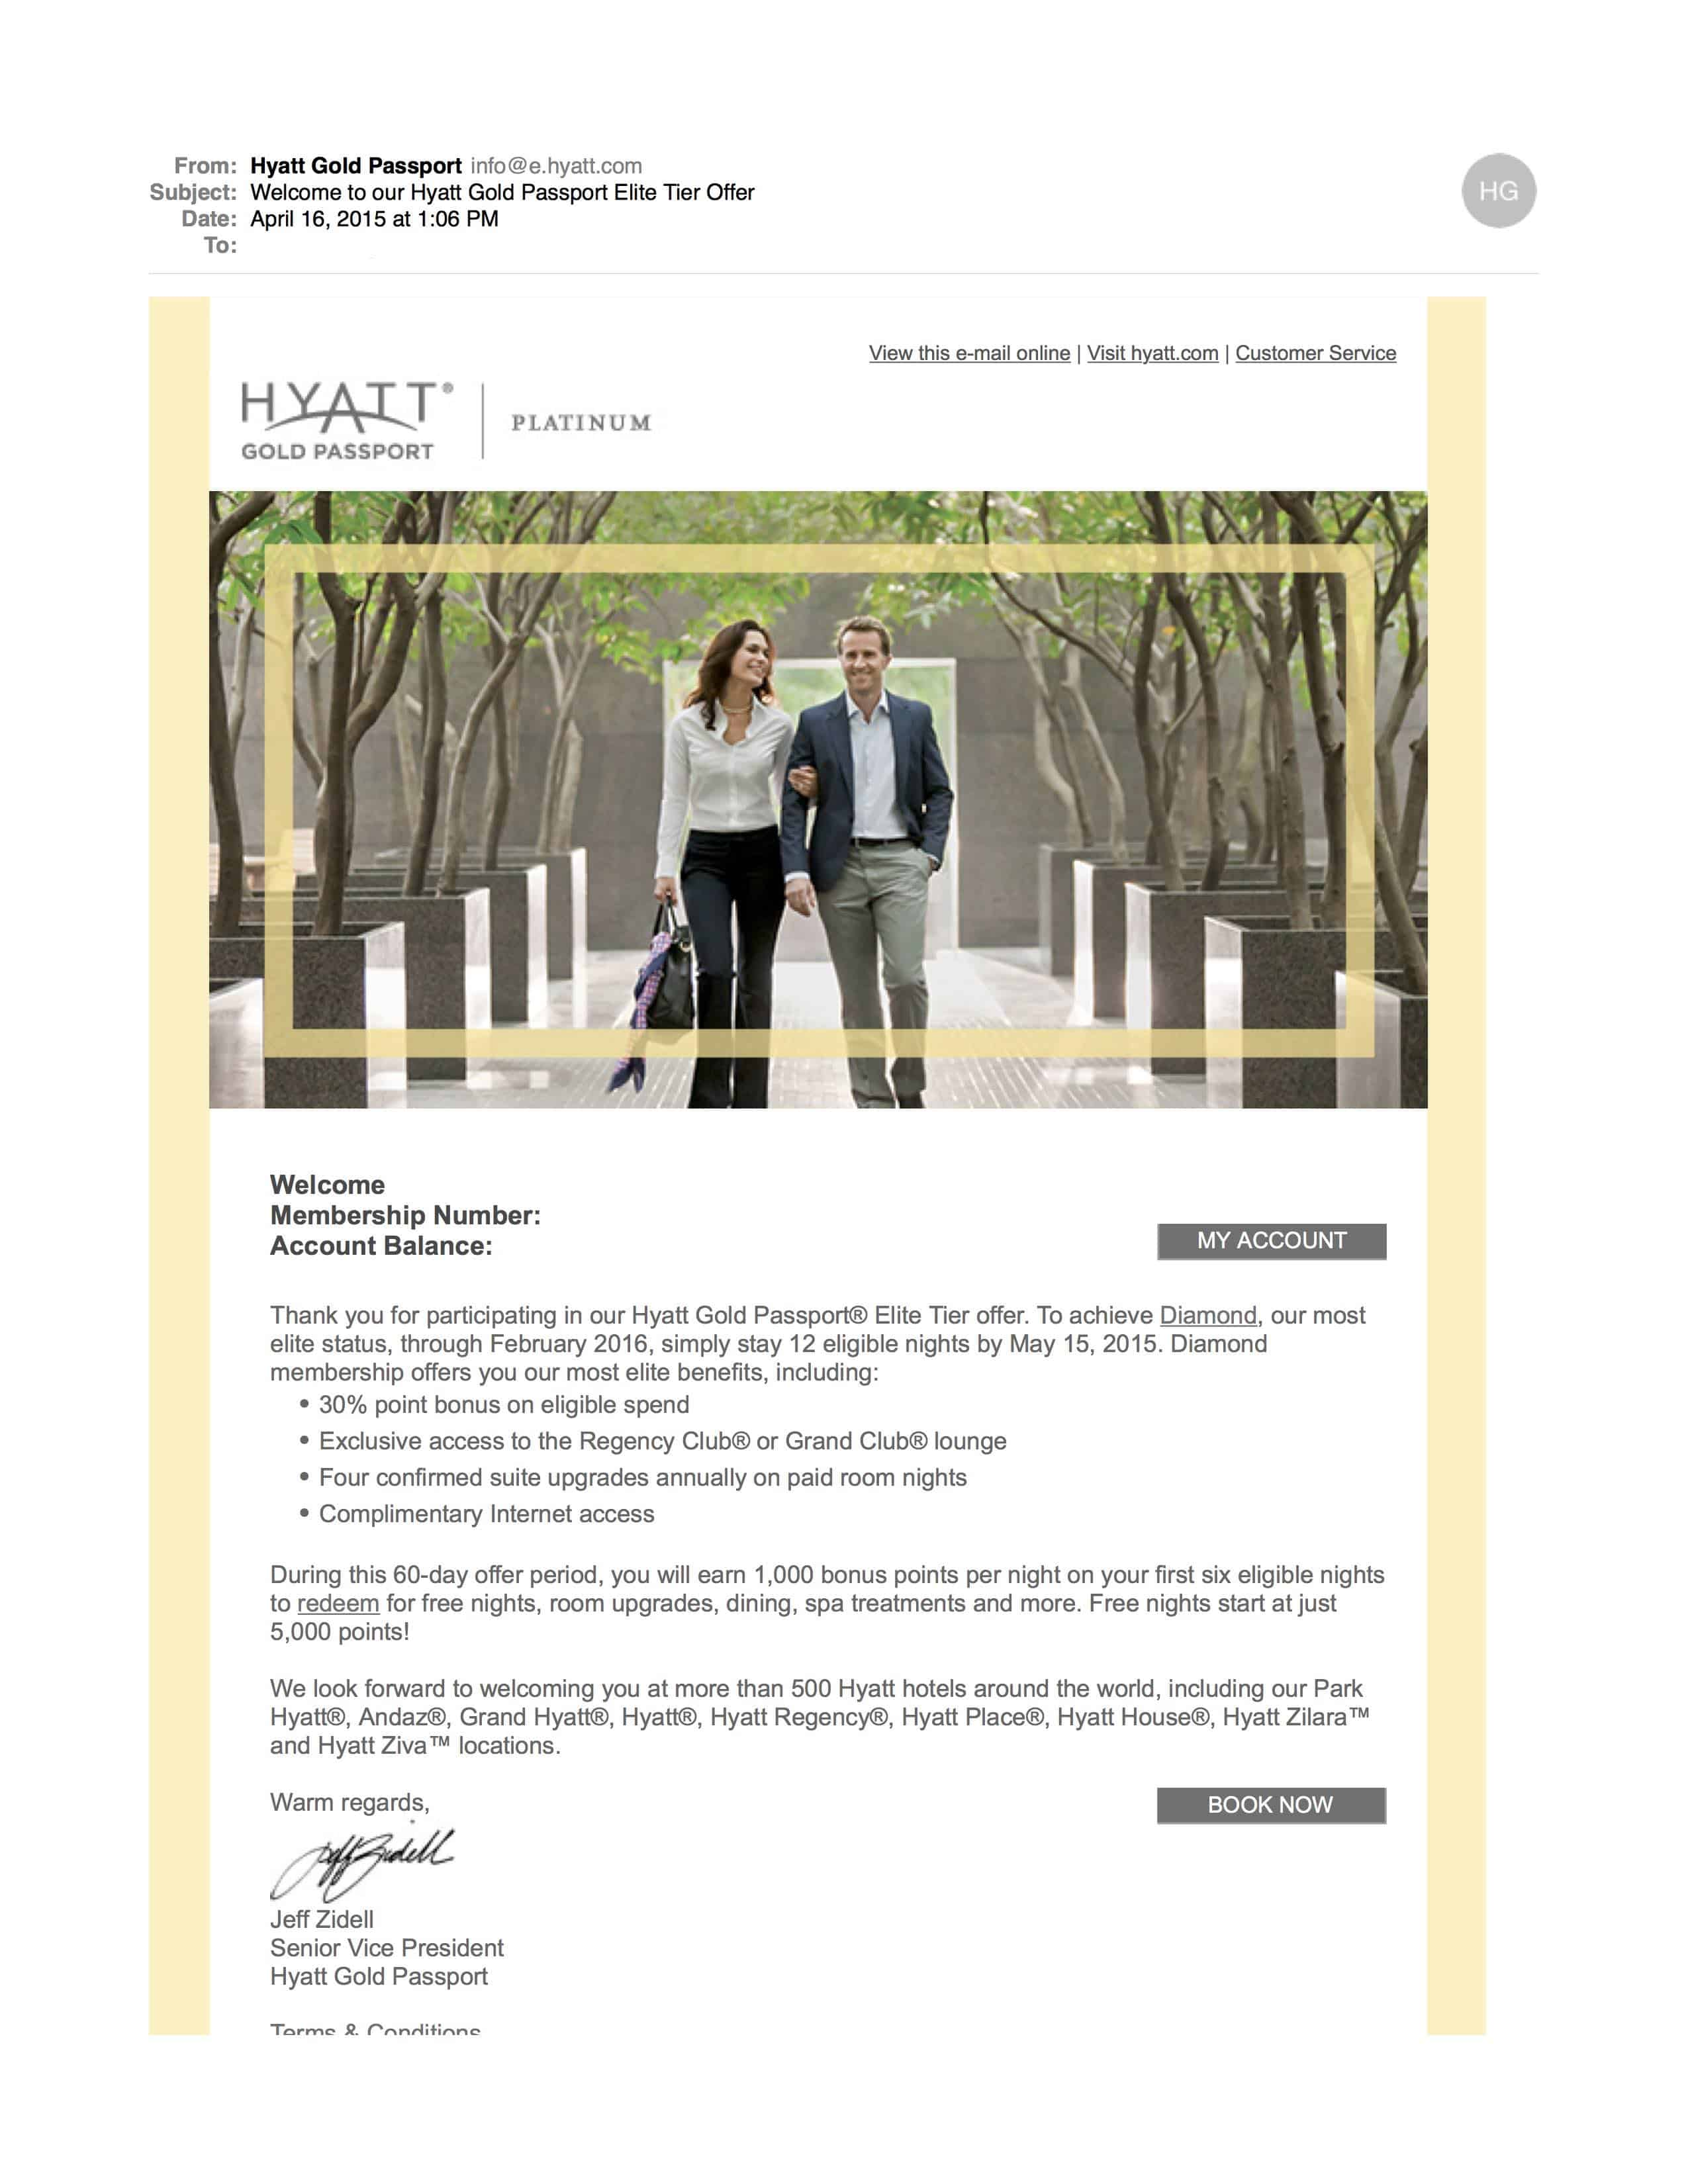 Hyatt Gold Passport Diamond Challenge